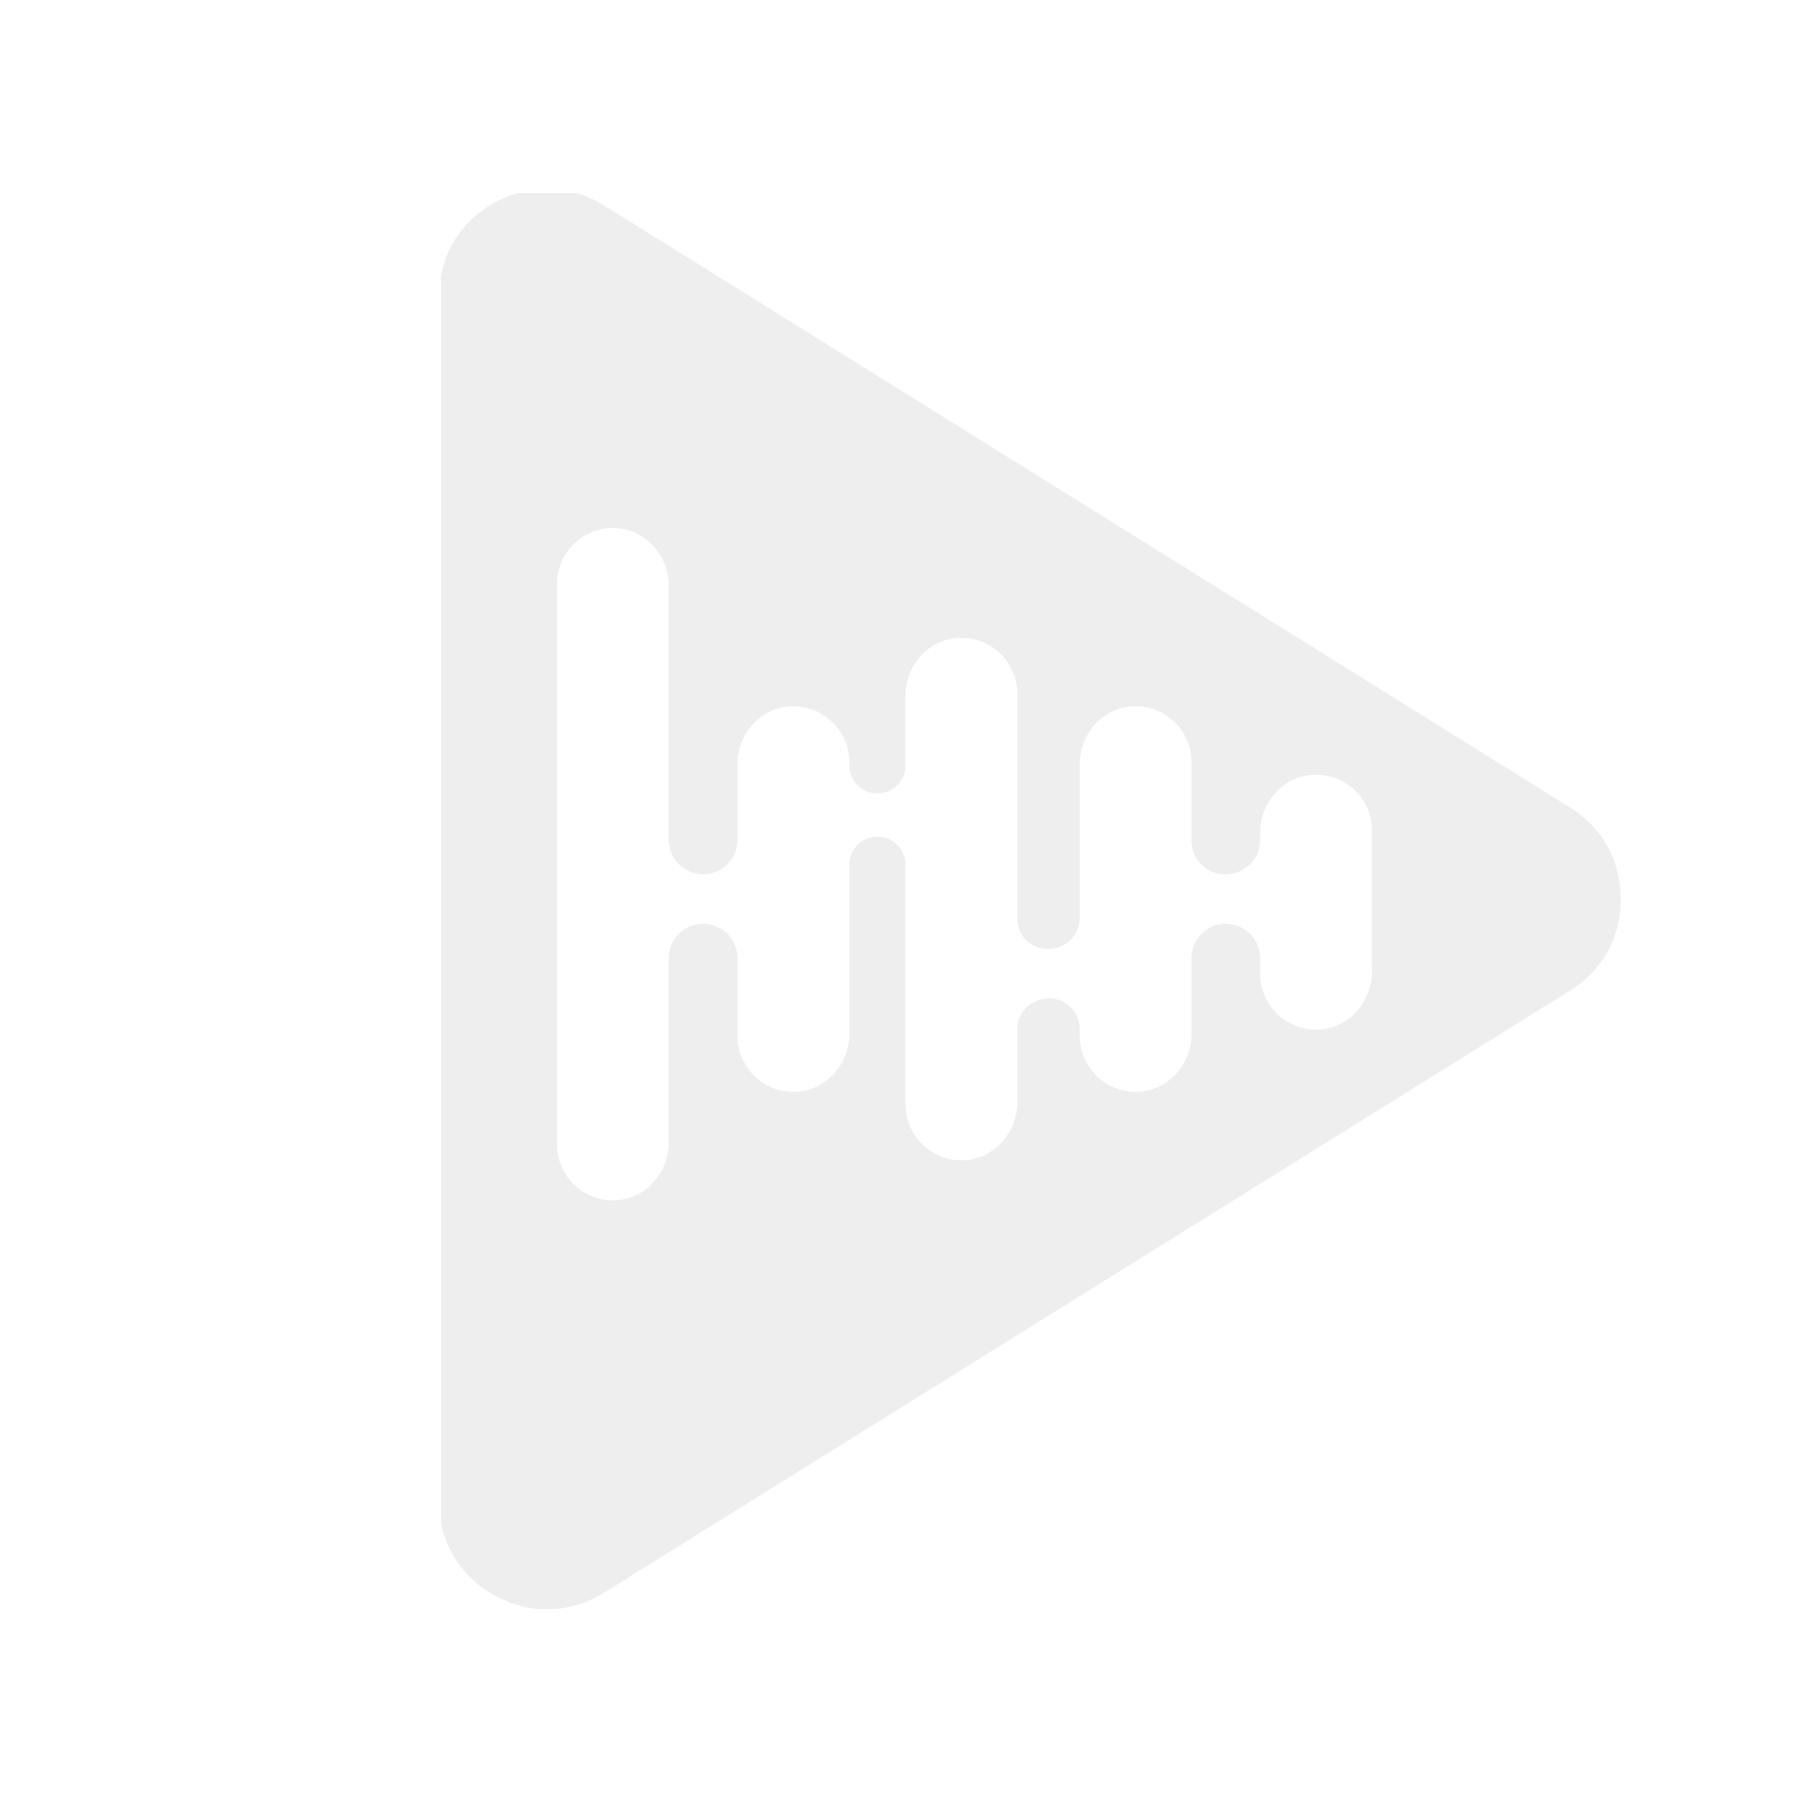 Kufatec Fistune 39818